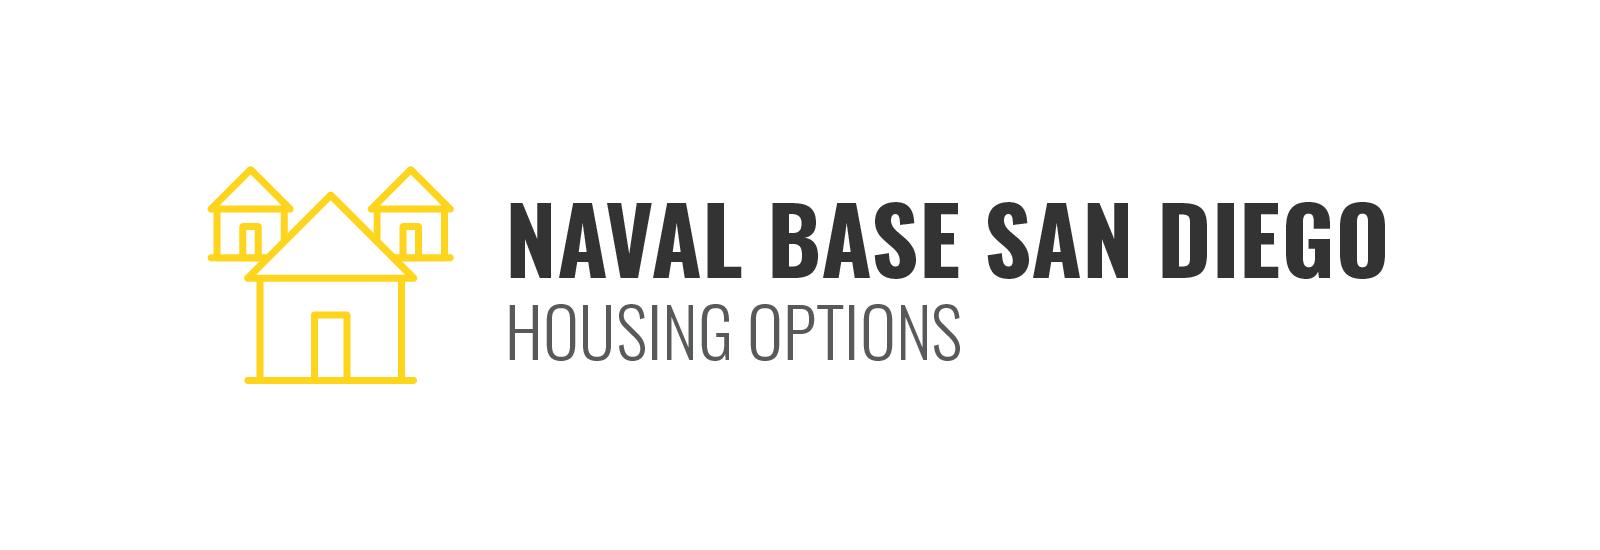 Naval Base San Diego Housing Options